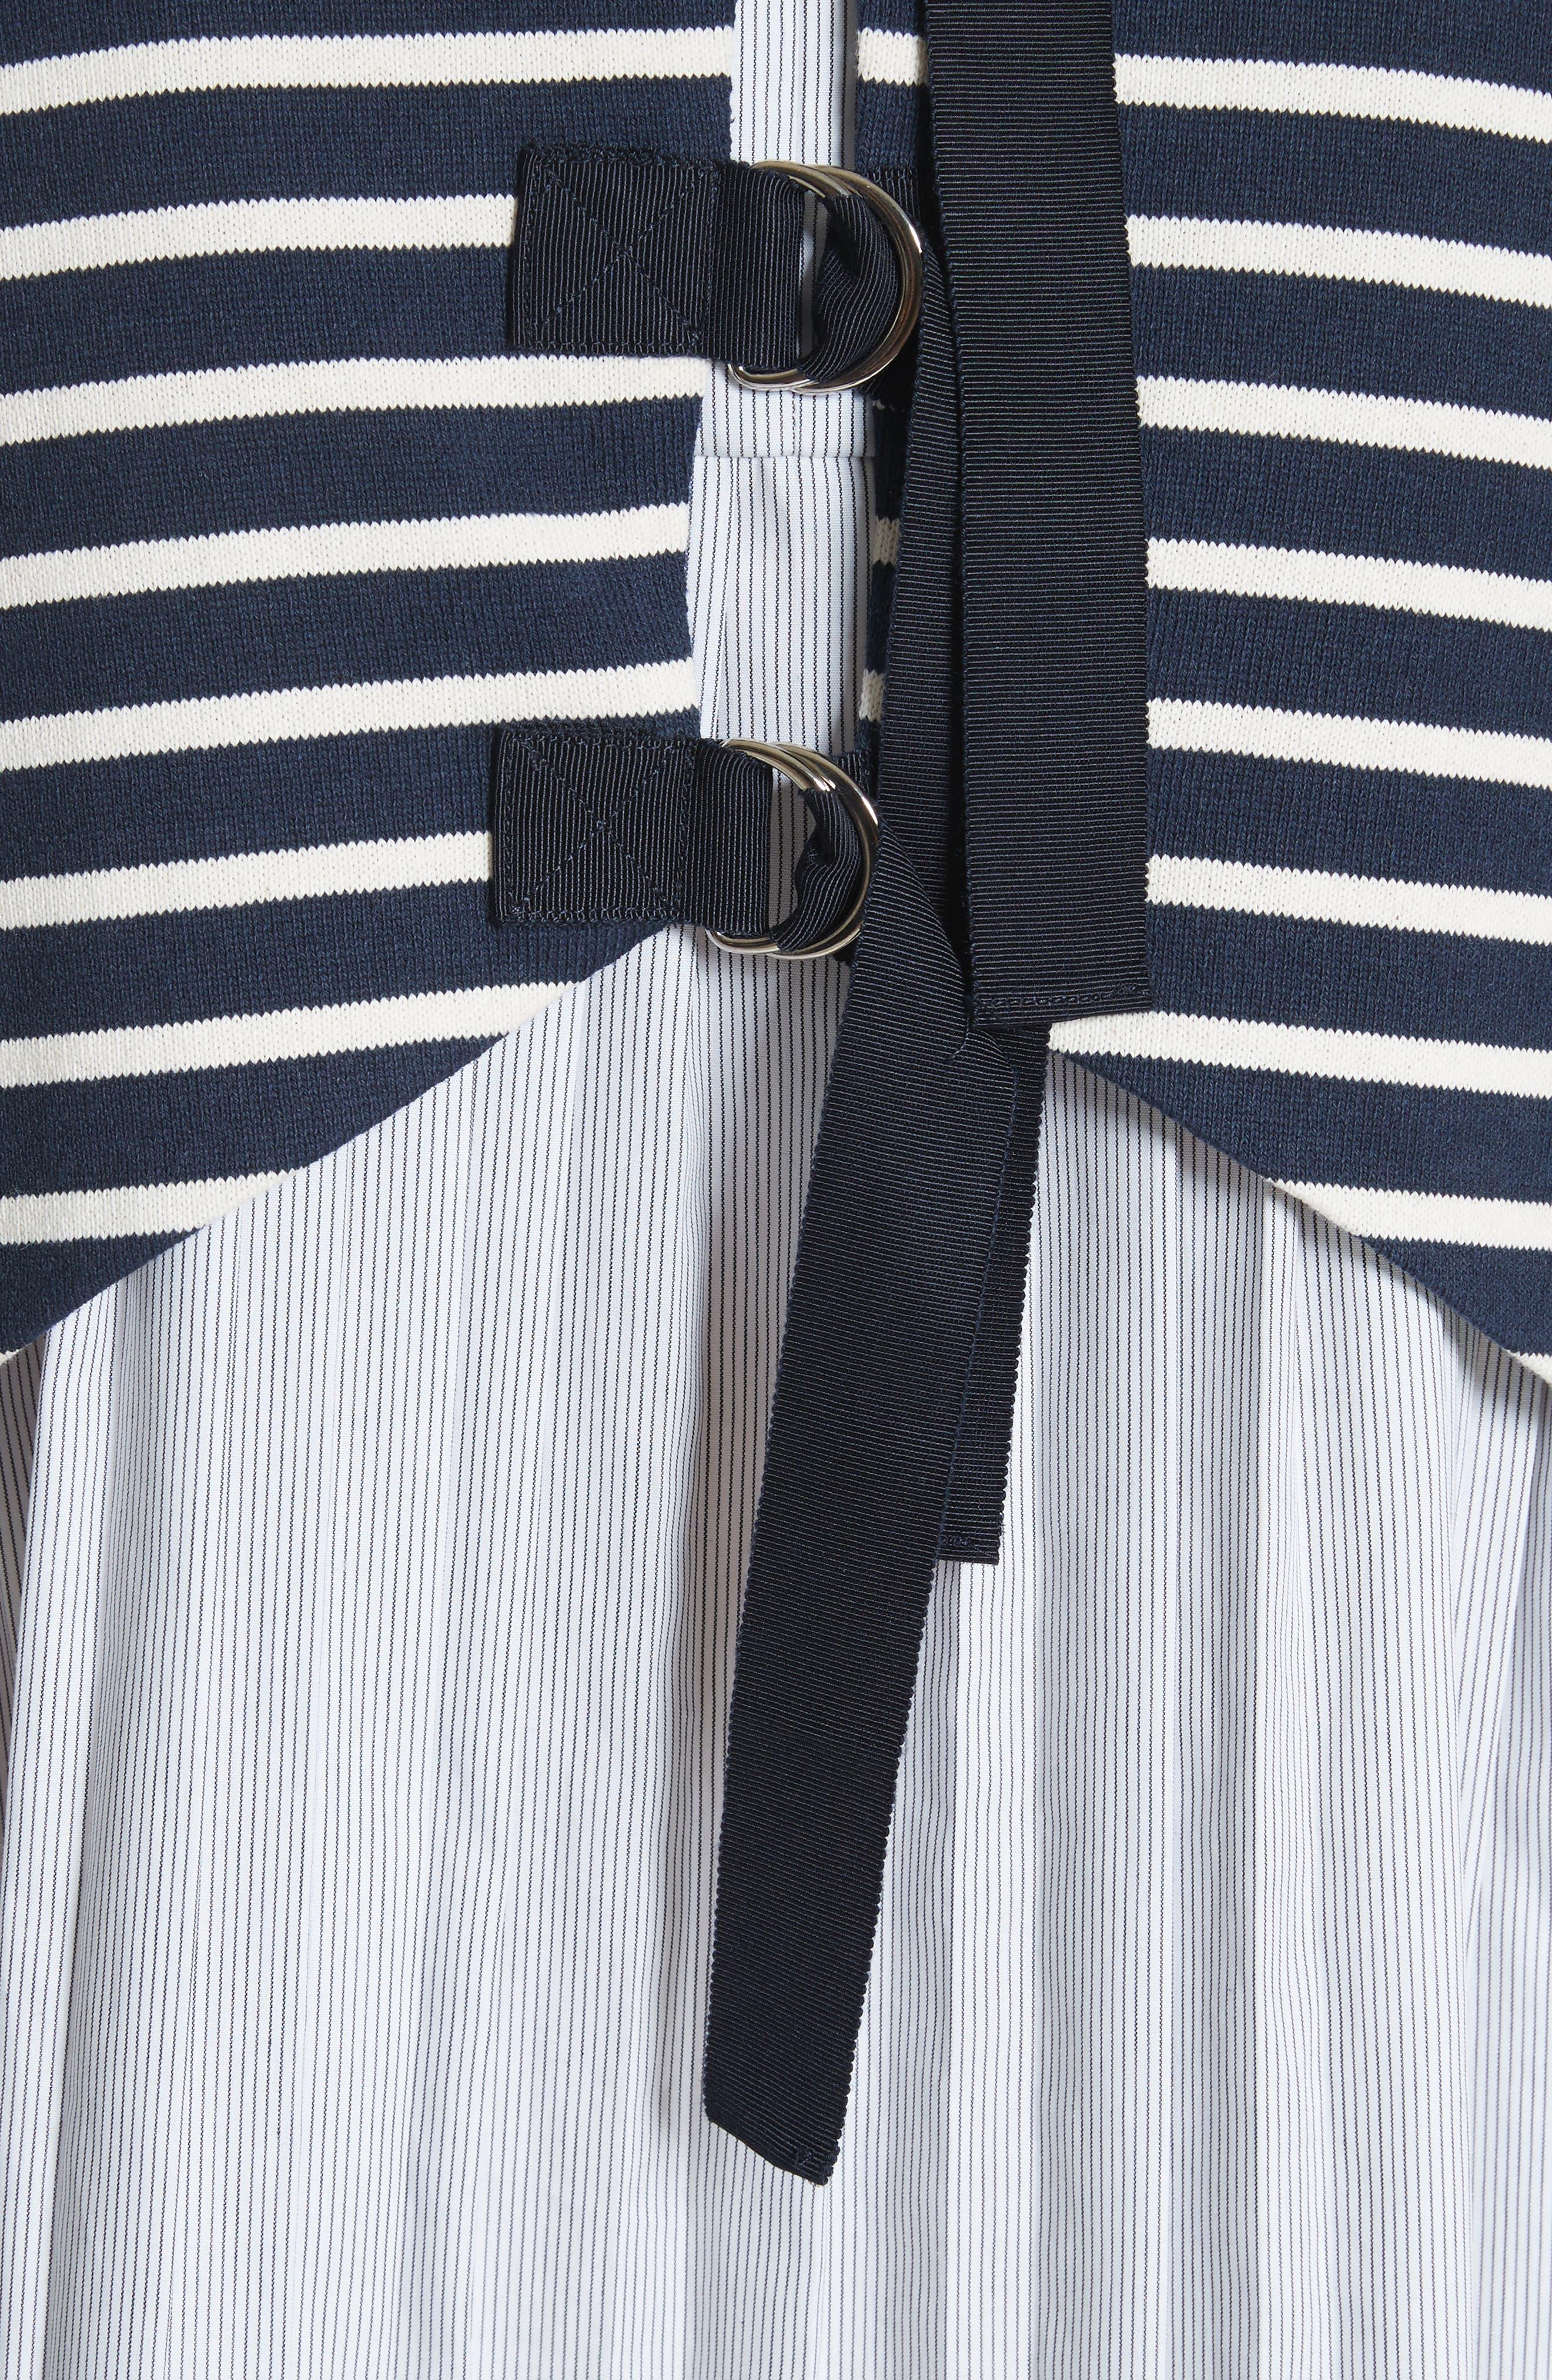 Latch Back Tunic Dress,                             Alternate thumbnail 5, color,                             Navy/ Cream Multi